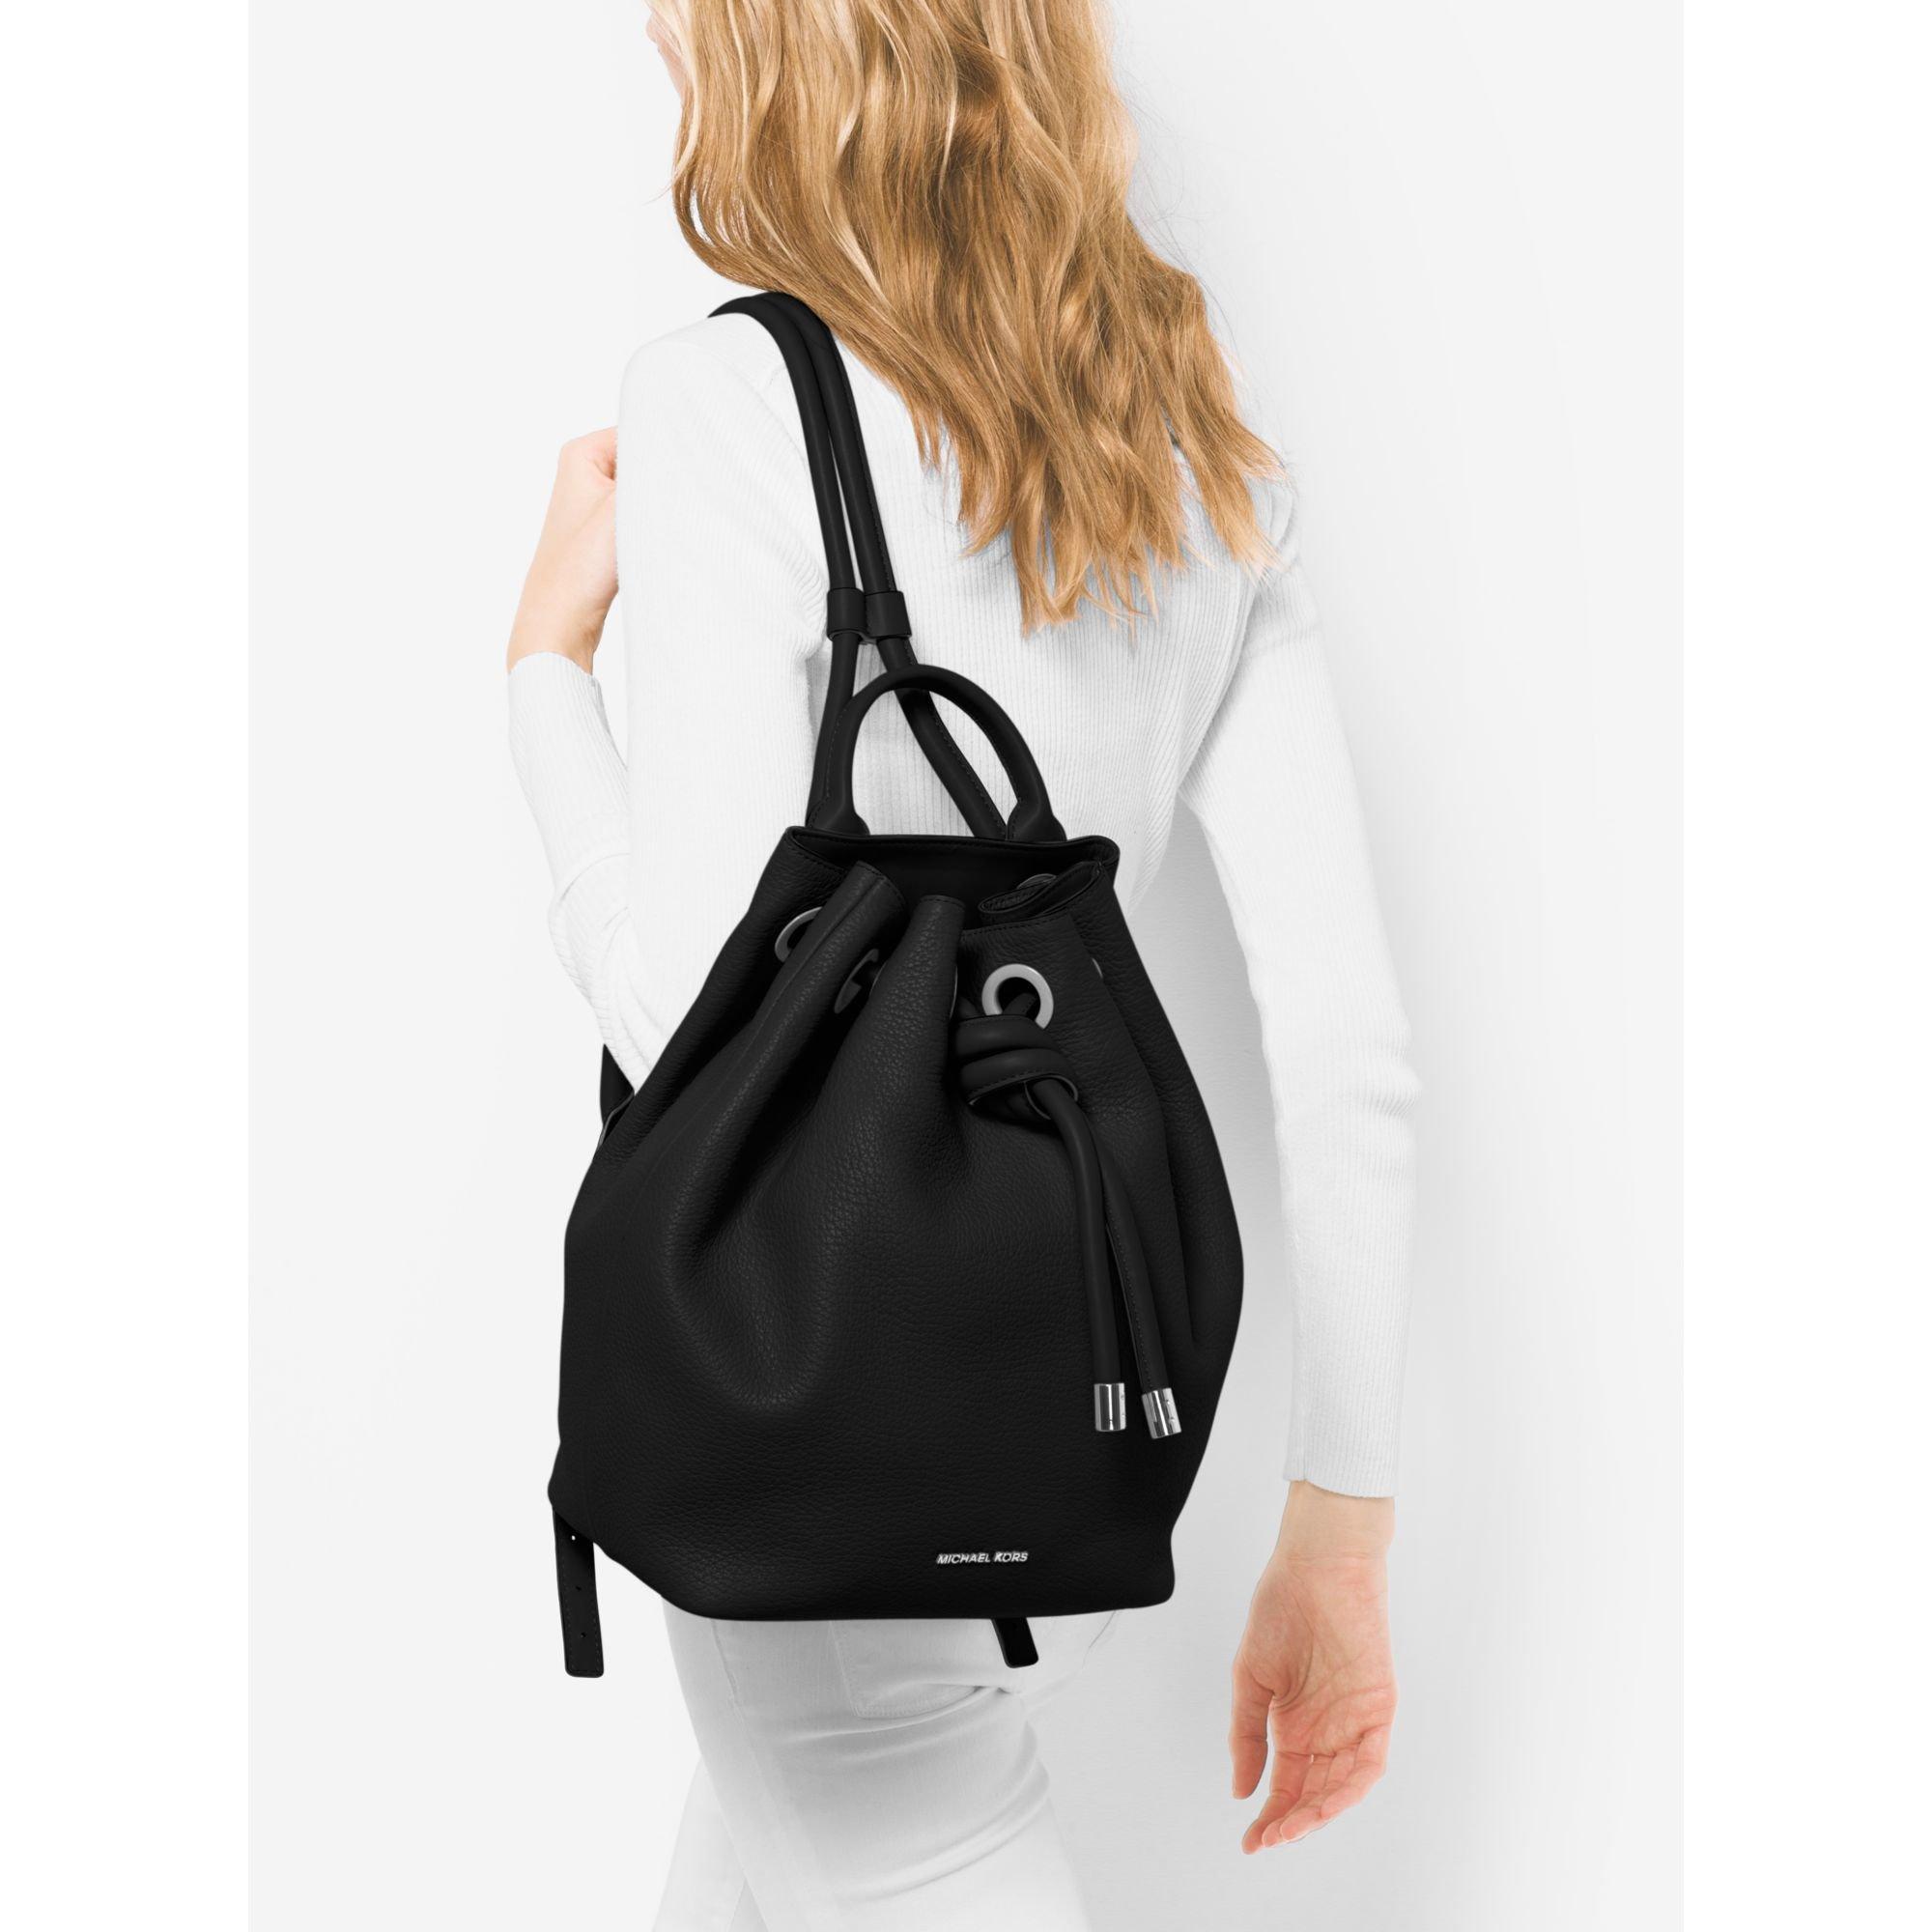 Michael kors Dalia Large Leather Backpack in Black | Lyst